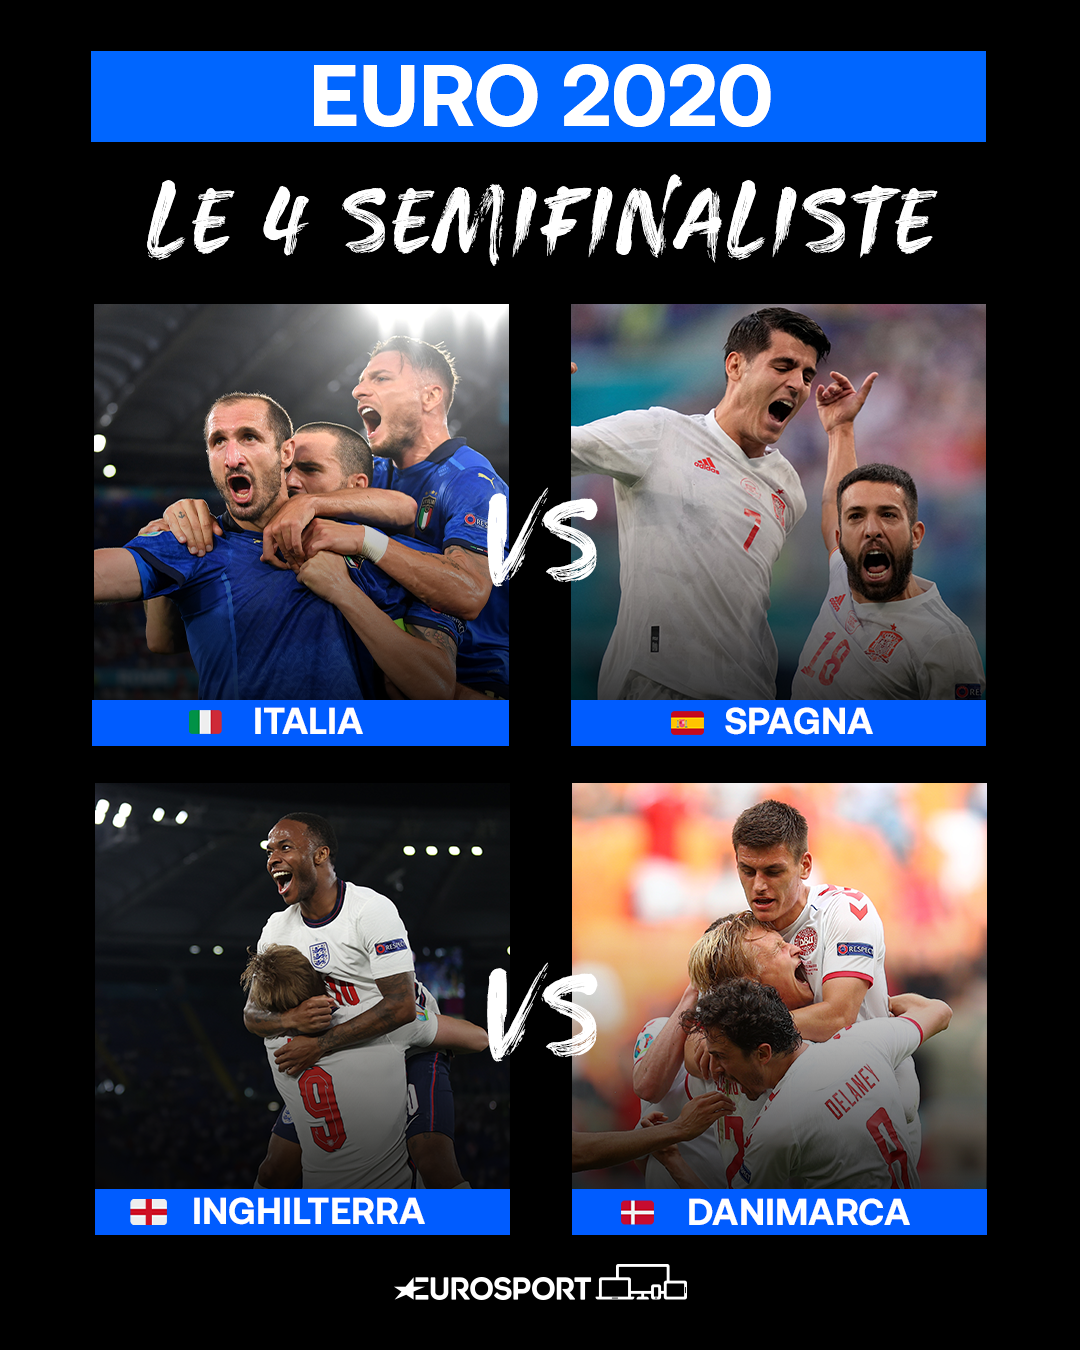 https://i.eurosport.com/2021/07/03/3166833.png